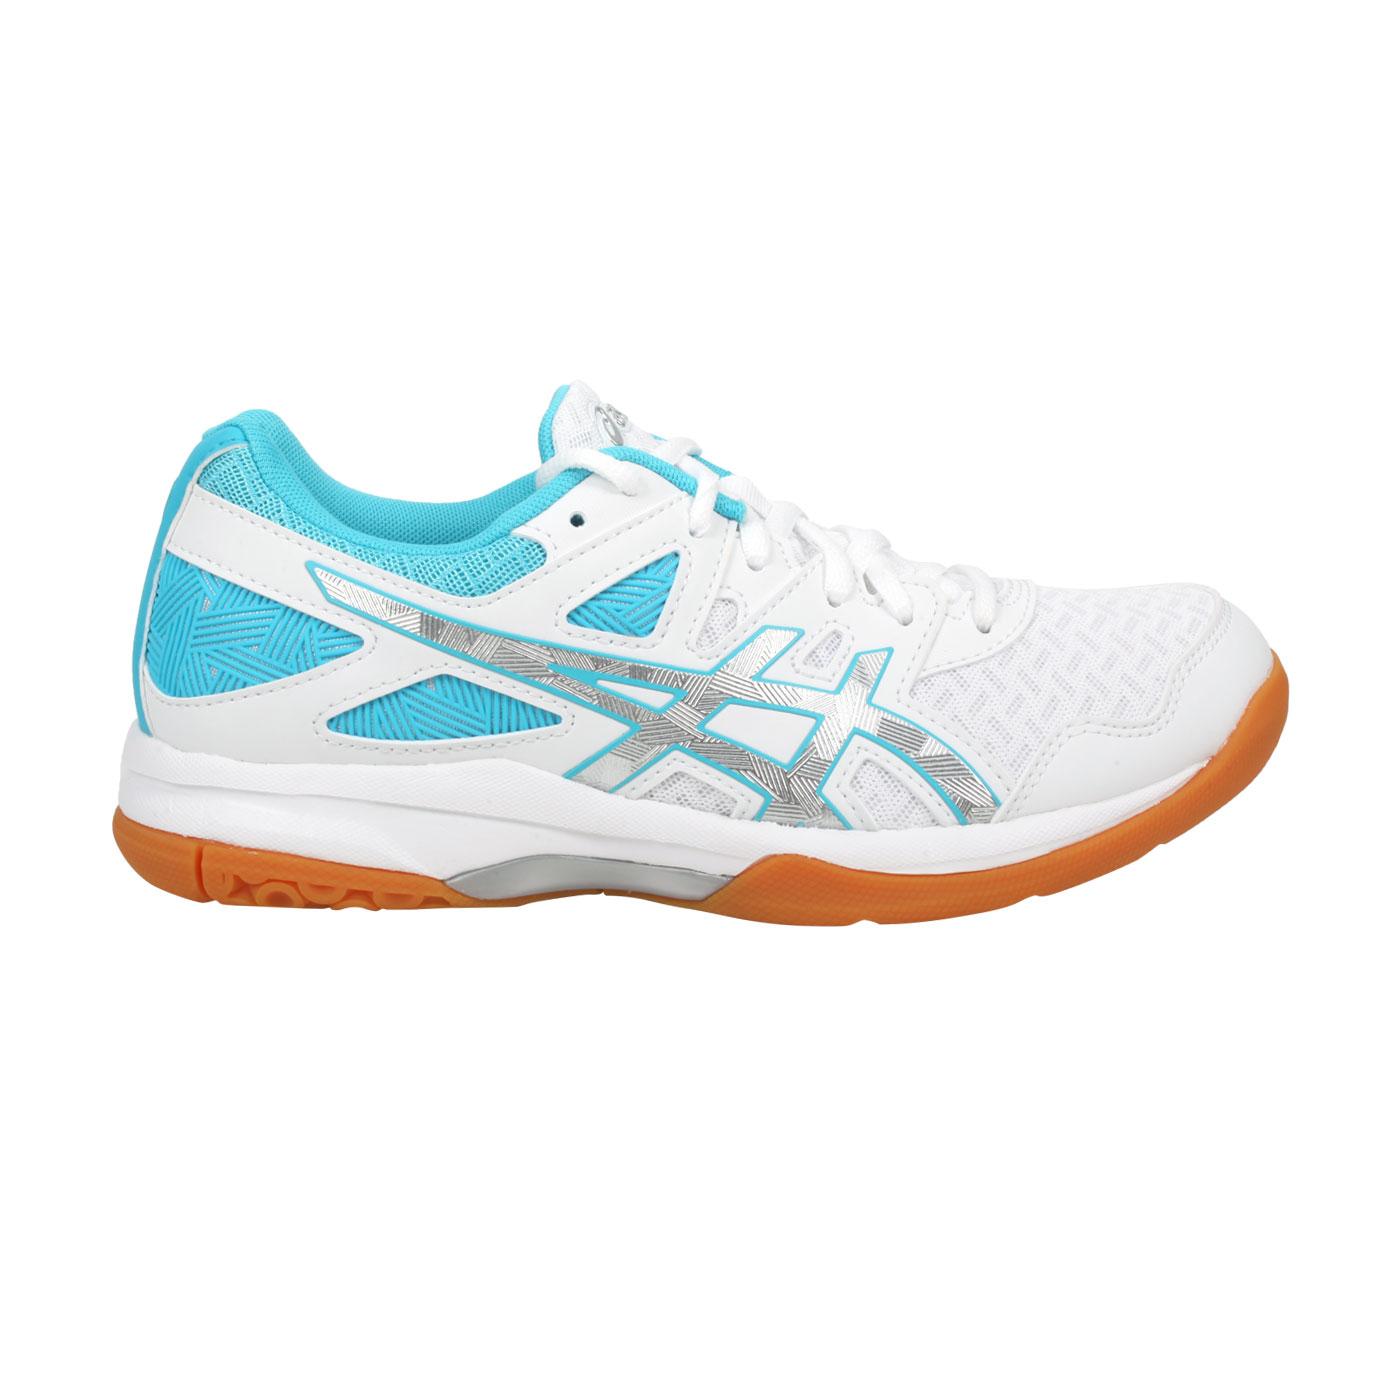 ASICS 女款排羽球鞋  @GEL-TASK 2@1072A038-102 - 白水藍銀